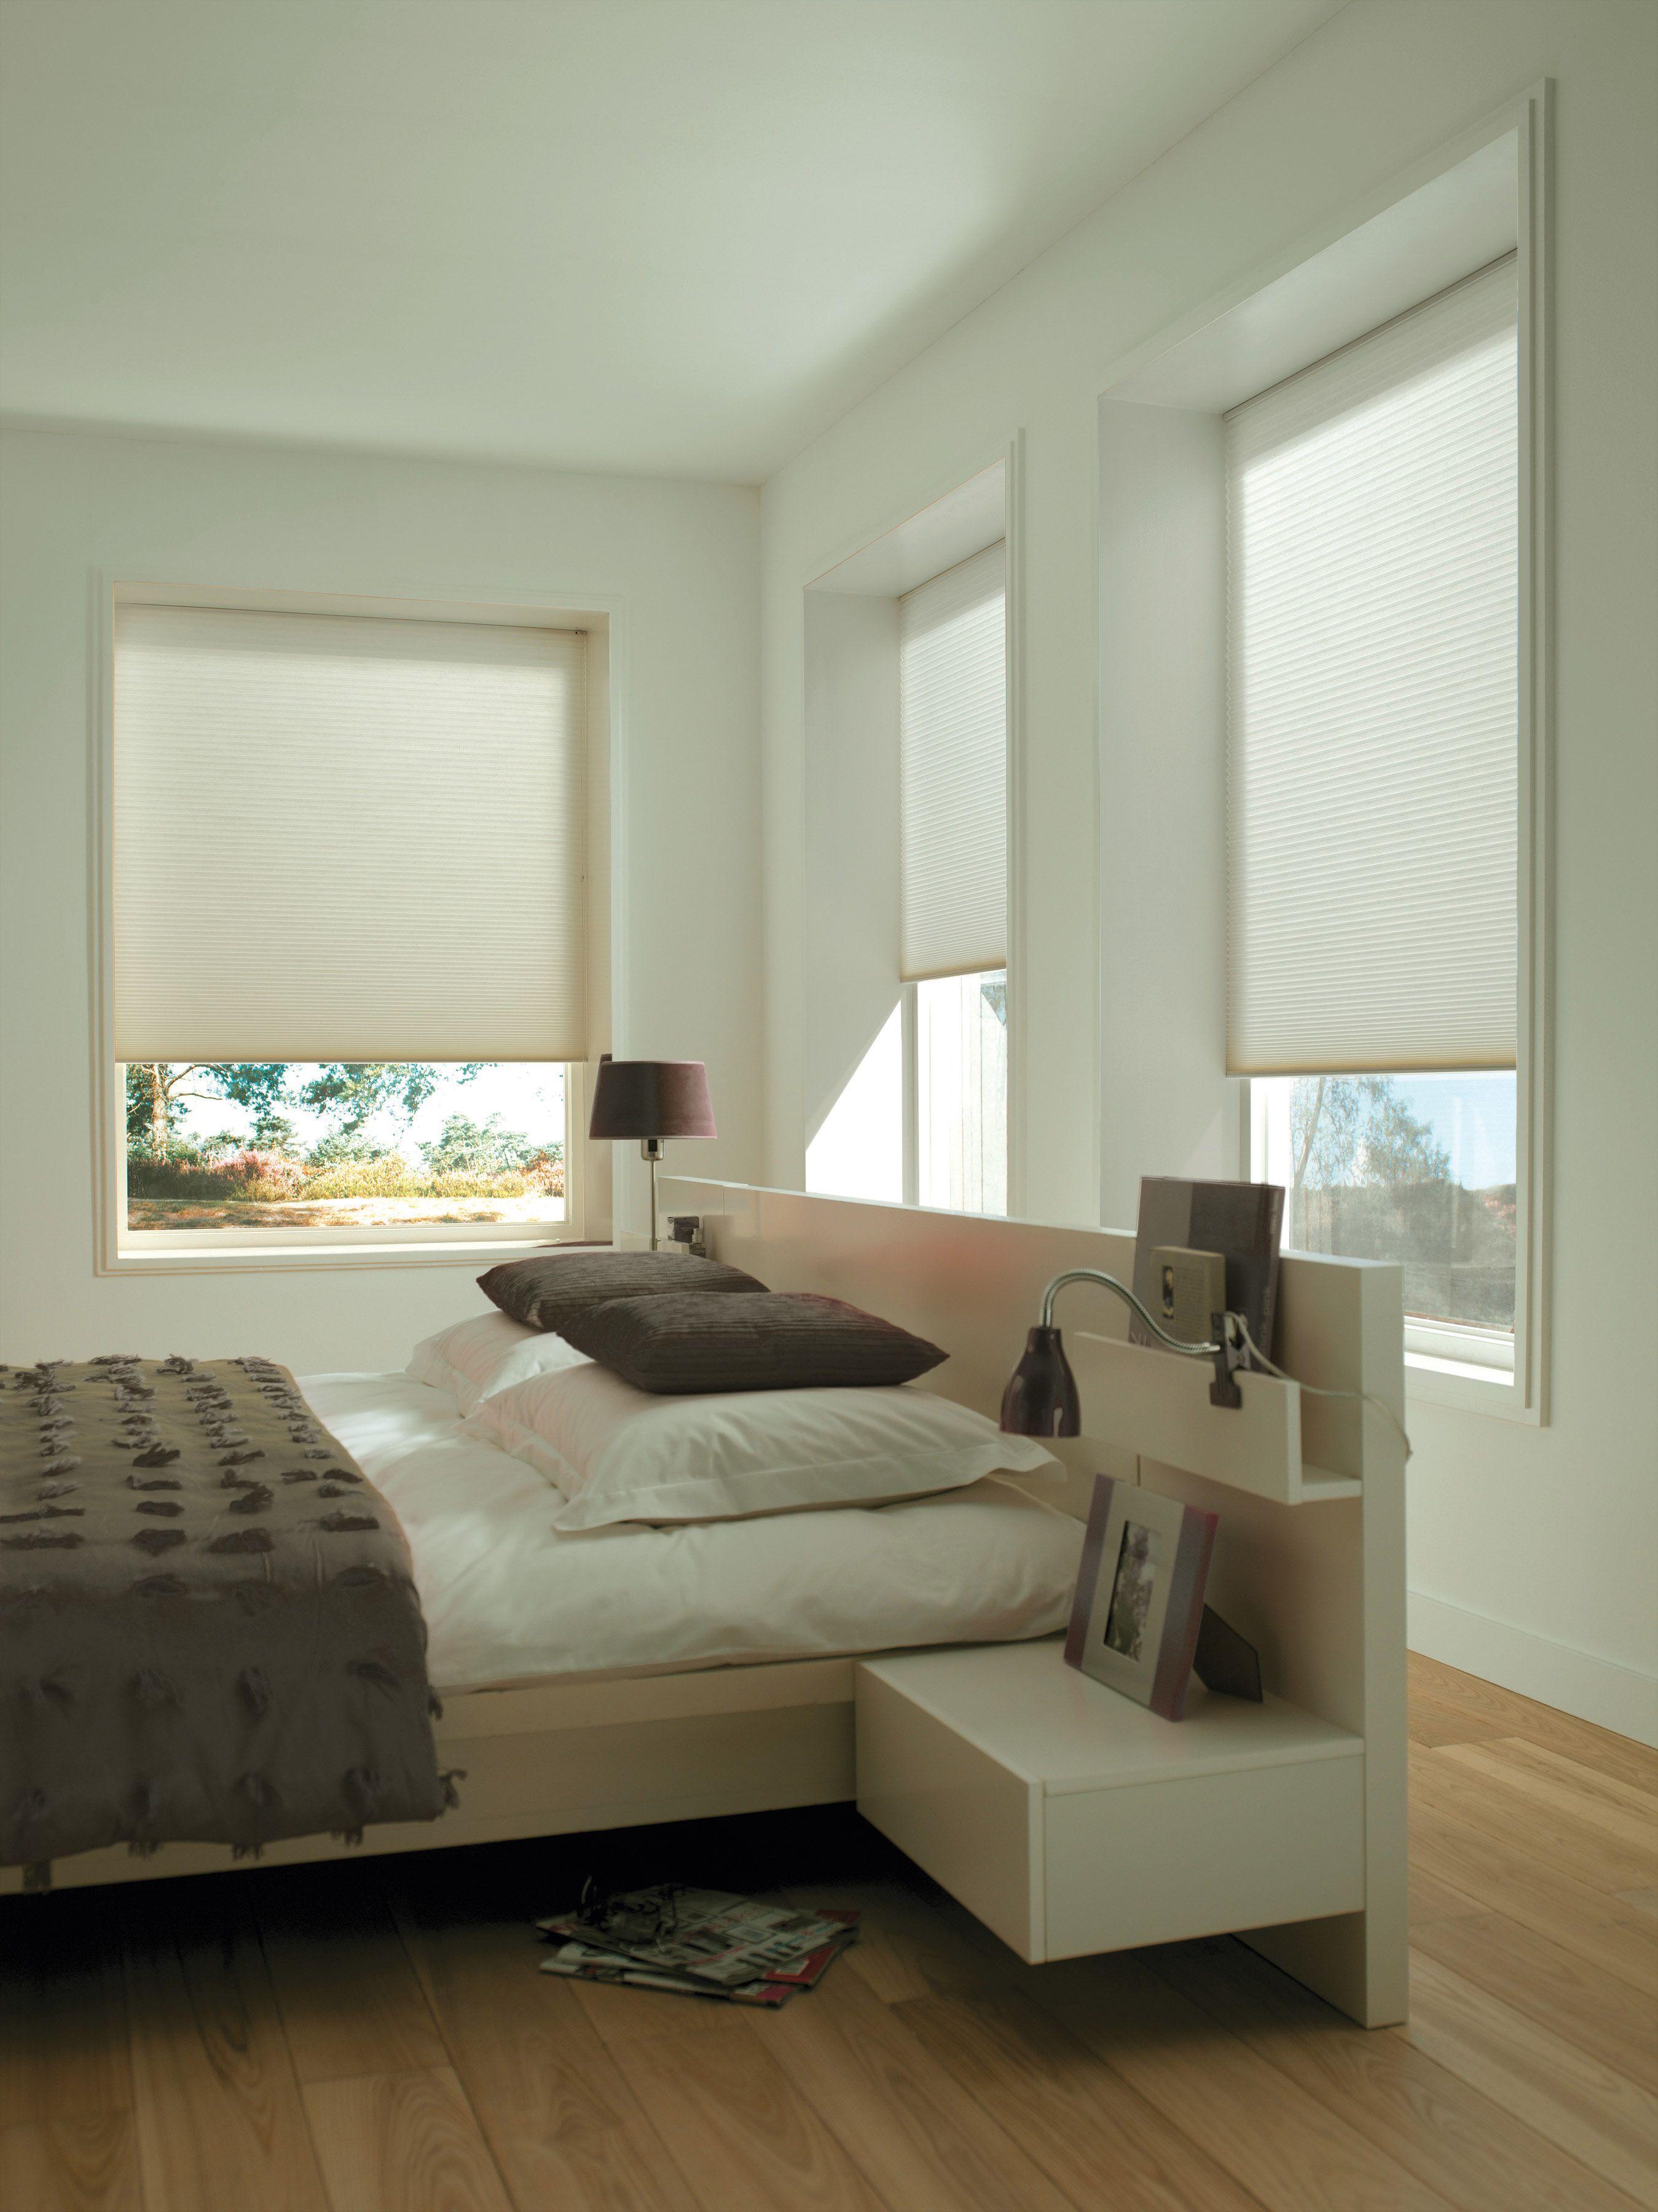 Etonnant Bedroom Roller Blinds From Apollo Blinds. Cream Window Blinds. Best Blinds  For Bedrooms. Neutral Blinds. Modern Window Dressing Ideas. Roller Blinds.